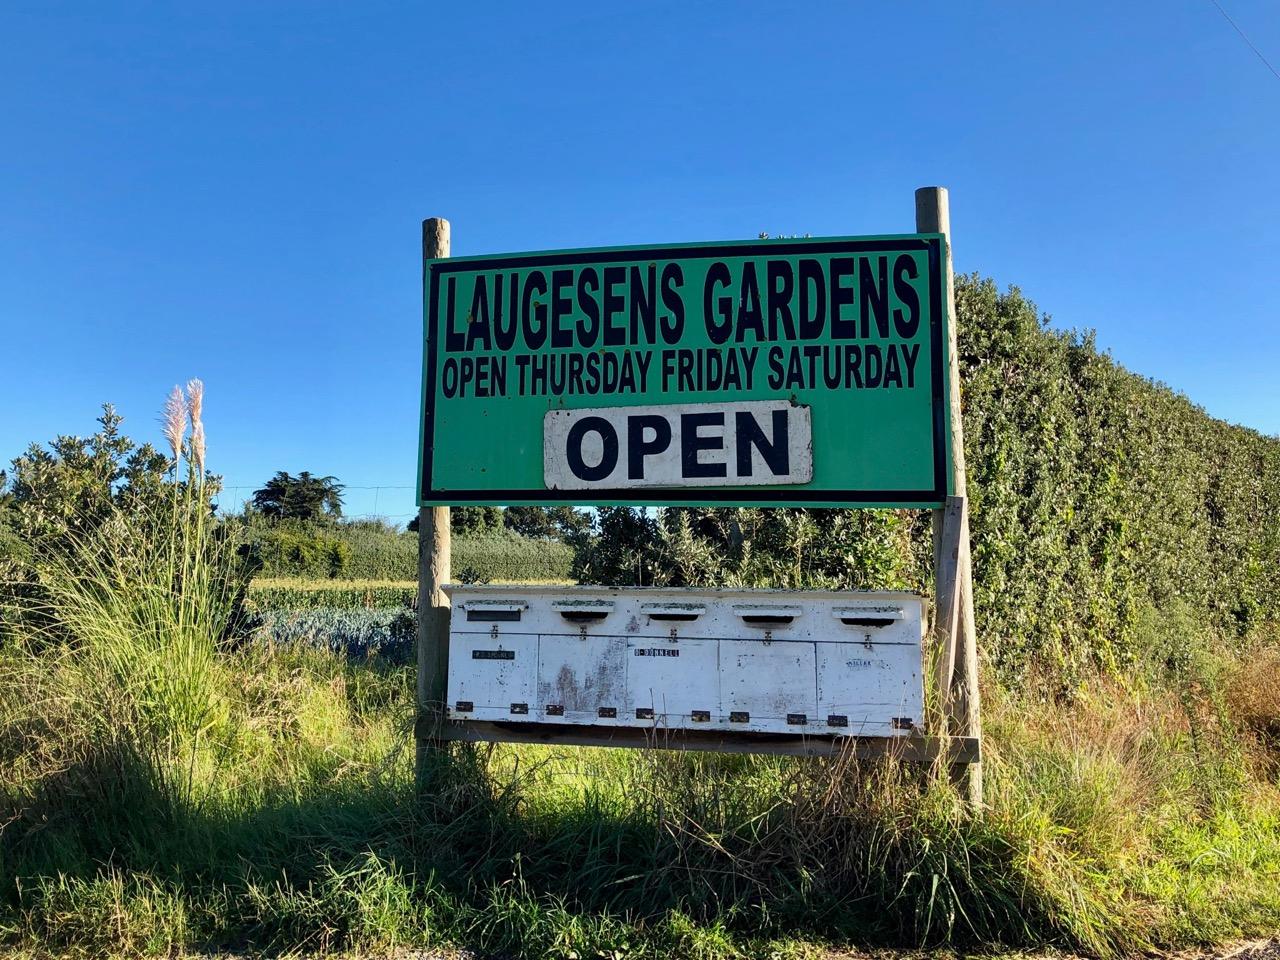 laugesens gardens